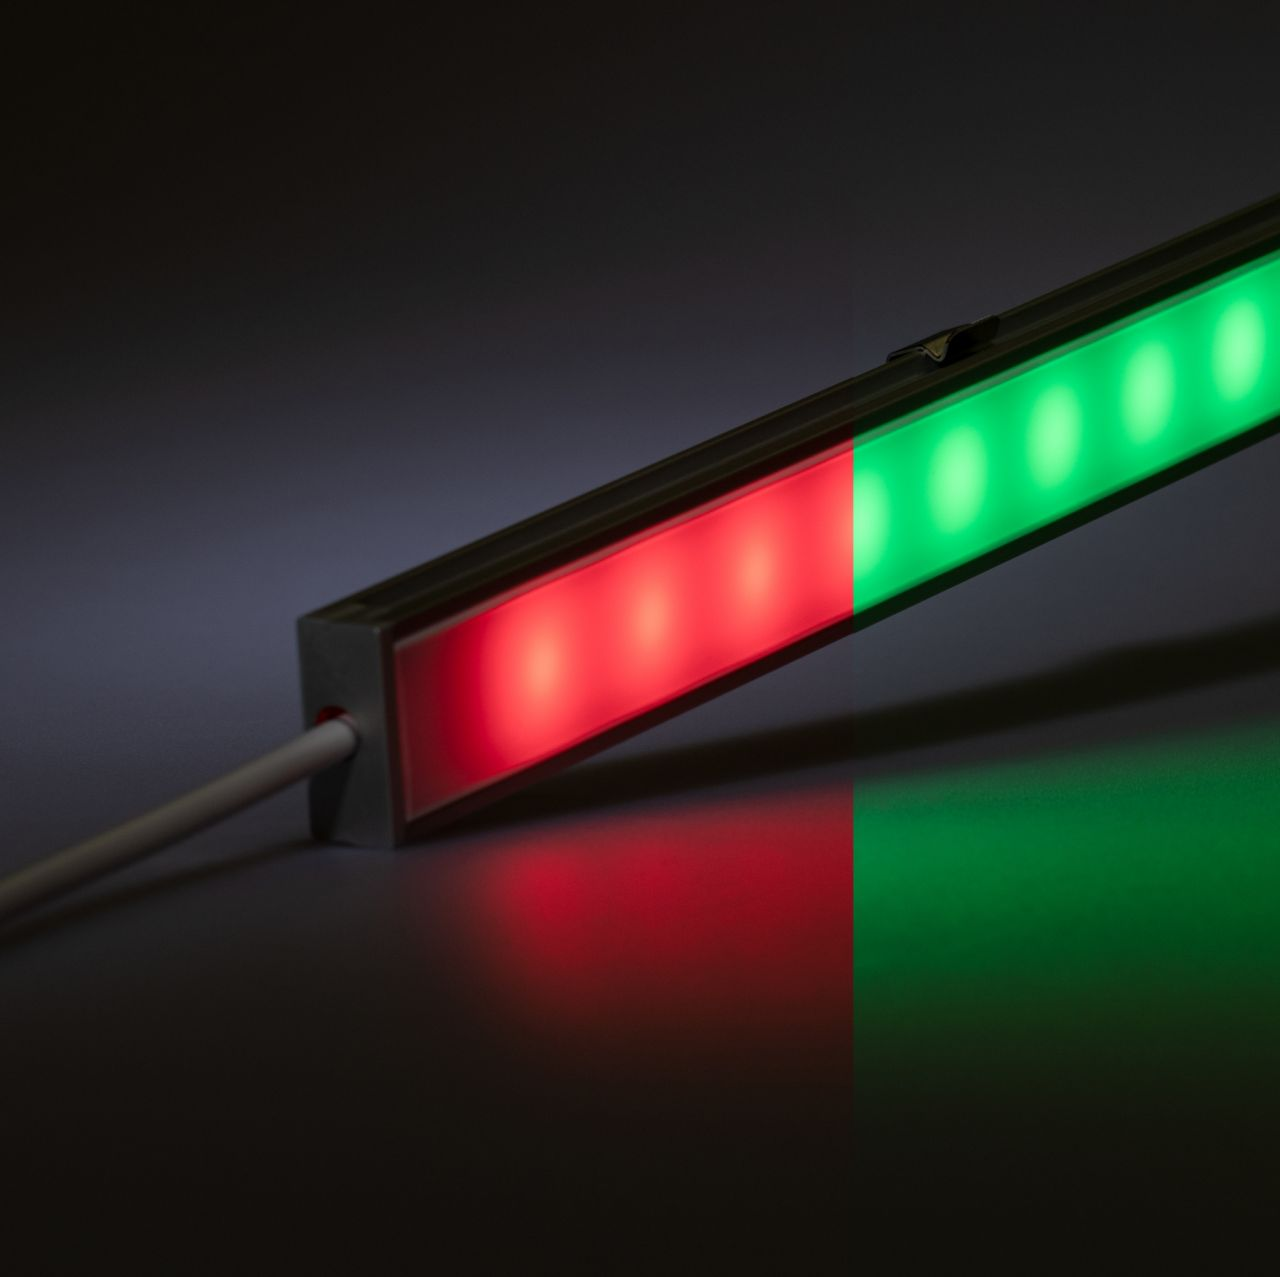 12V Aluminium LED Leiste mit wasserfester Abdeckung– RGB – diffuse Abdeckung - IP65